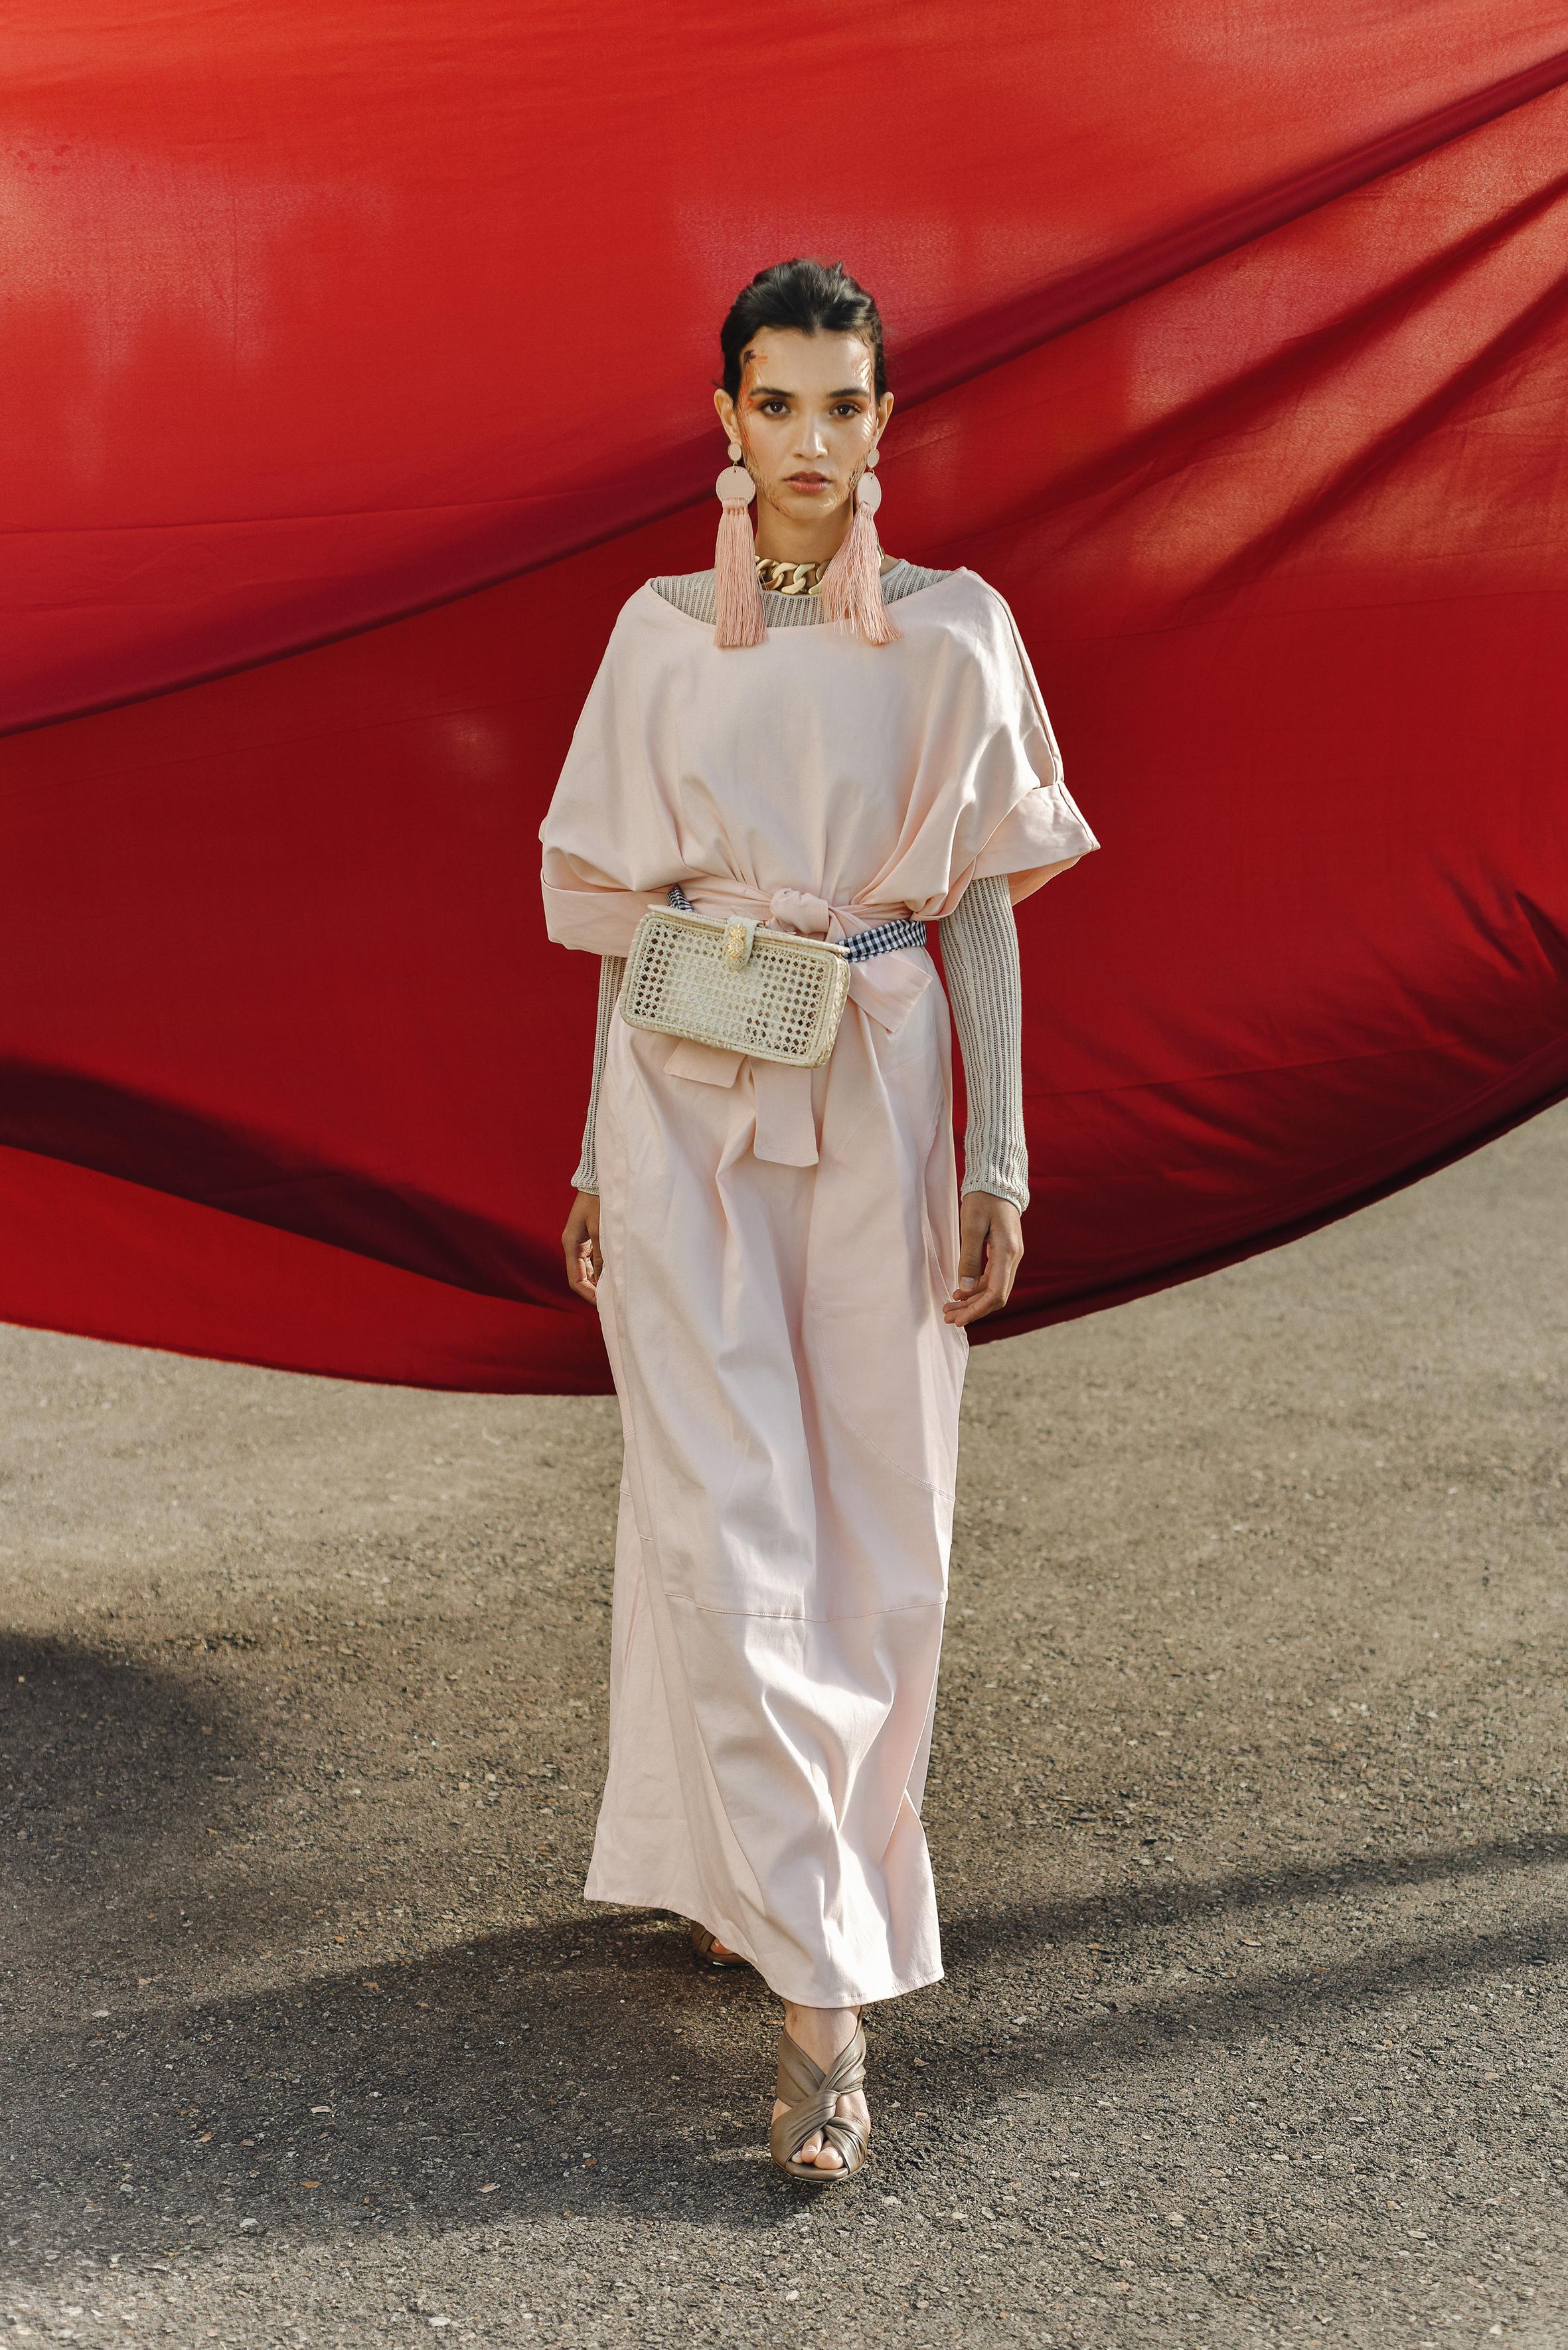 Dress. MICLOTT / Shoes. Carlota / Earrings. Adriana Tavera / Purse. Palma Canaria / Necklace. Sofía Llanos at Casa Precis.